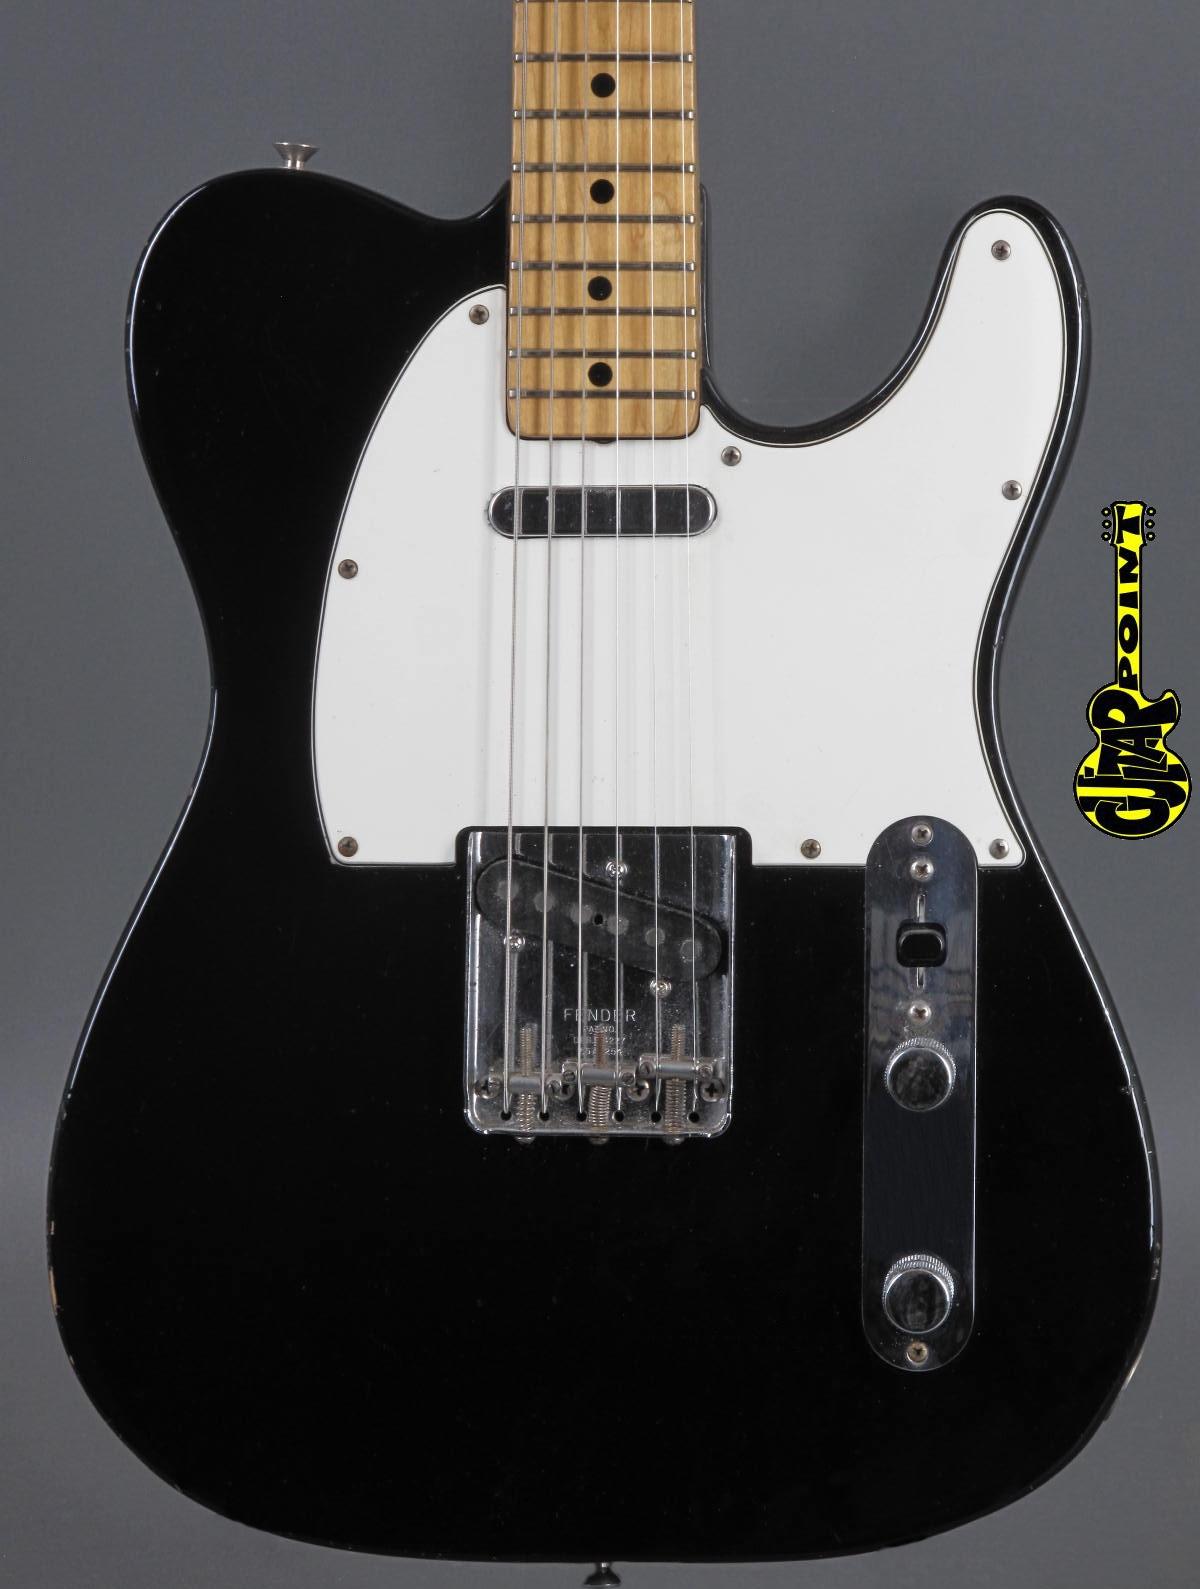 1972 Fender Telecaster -  Black  ...nice custom color !